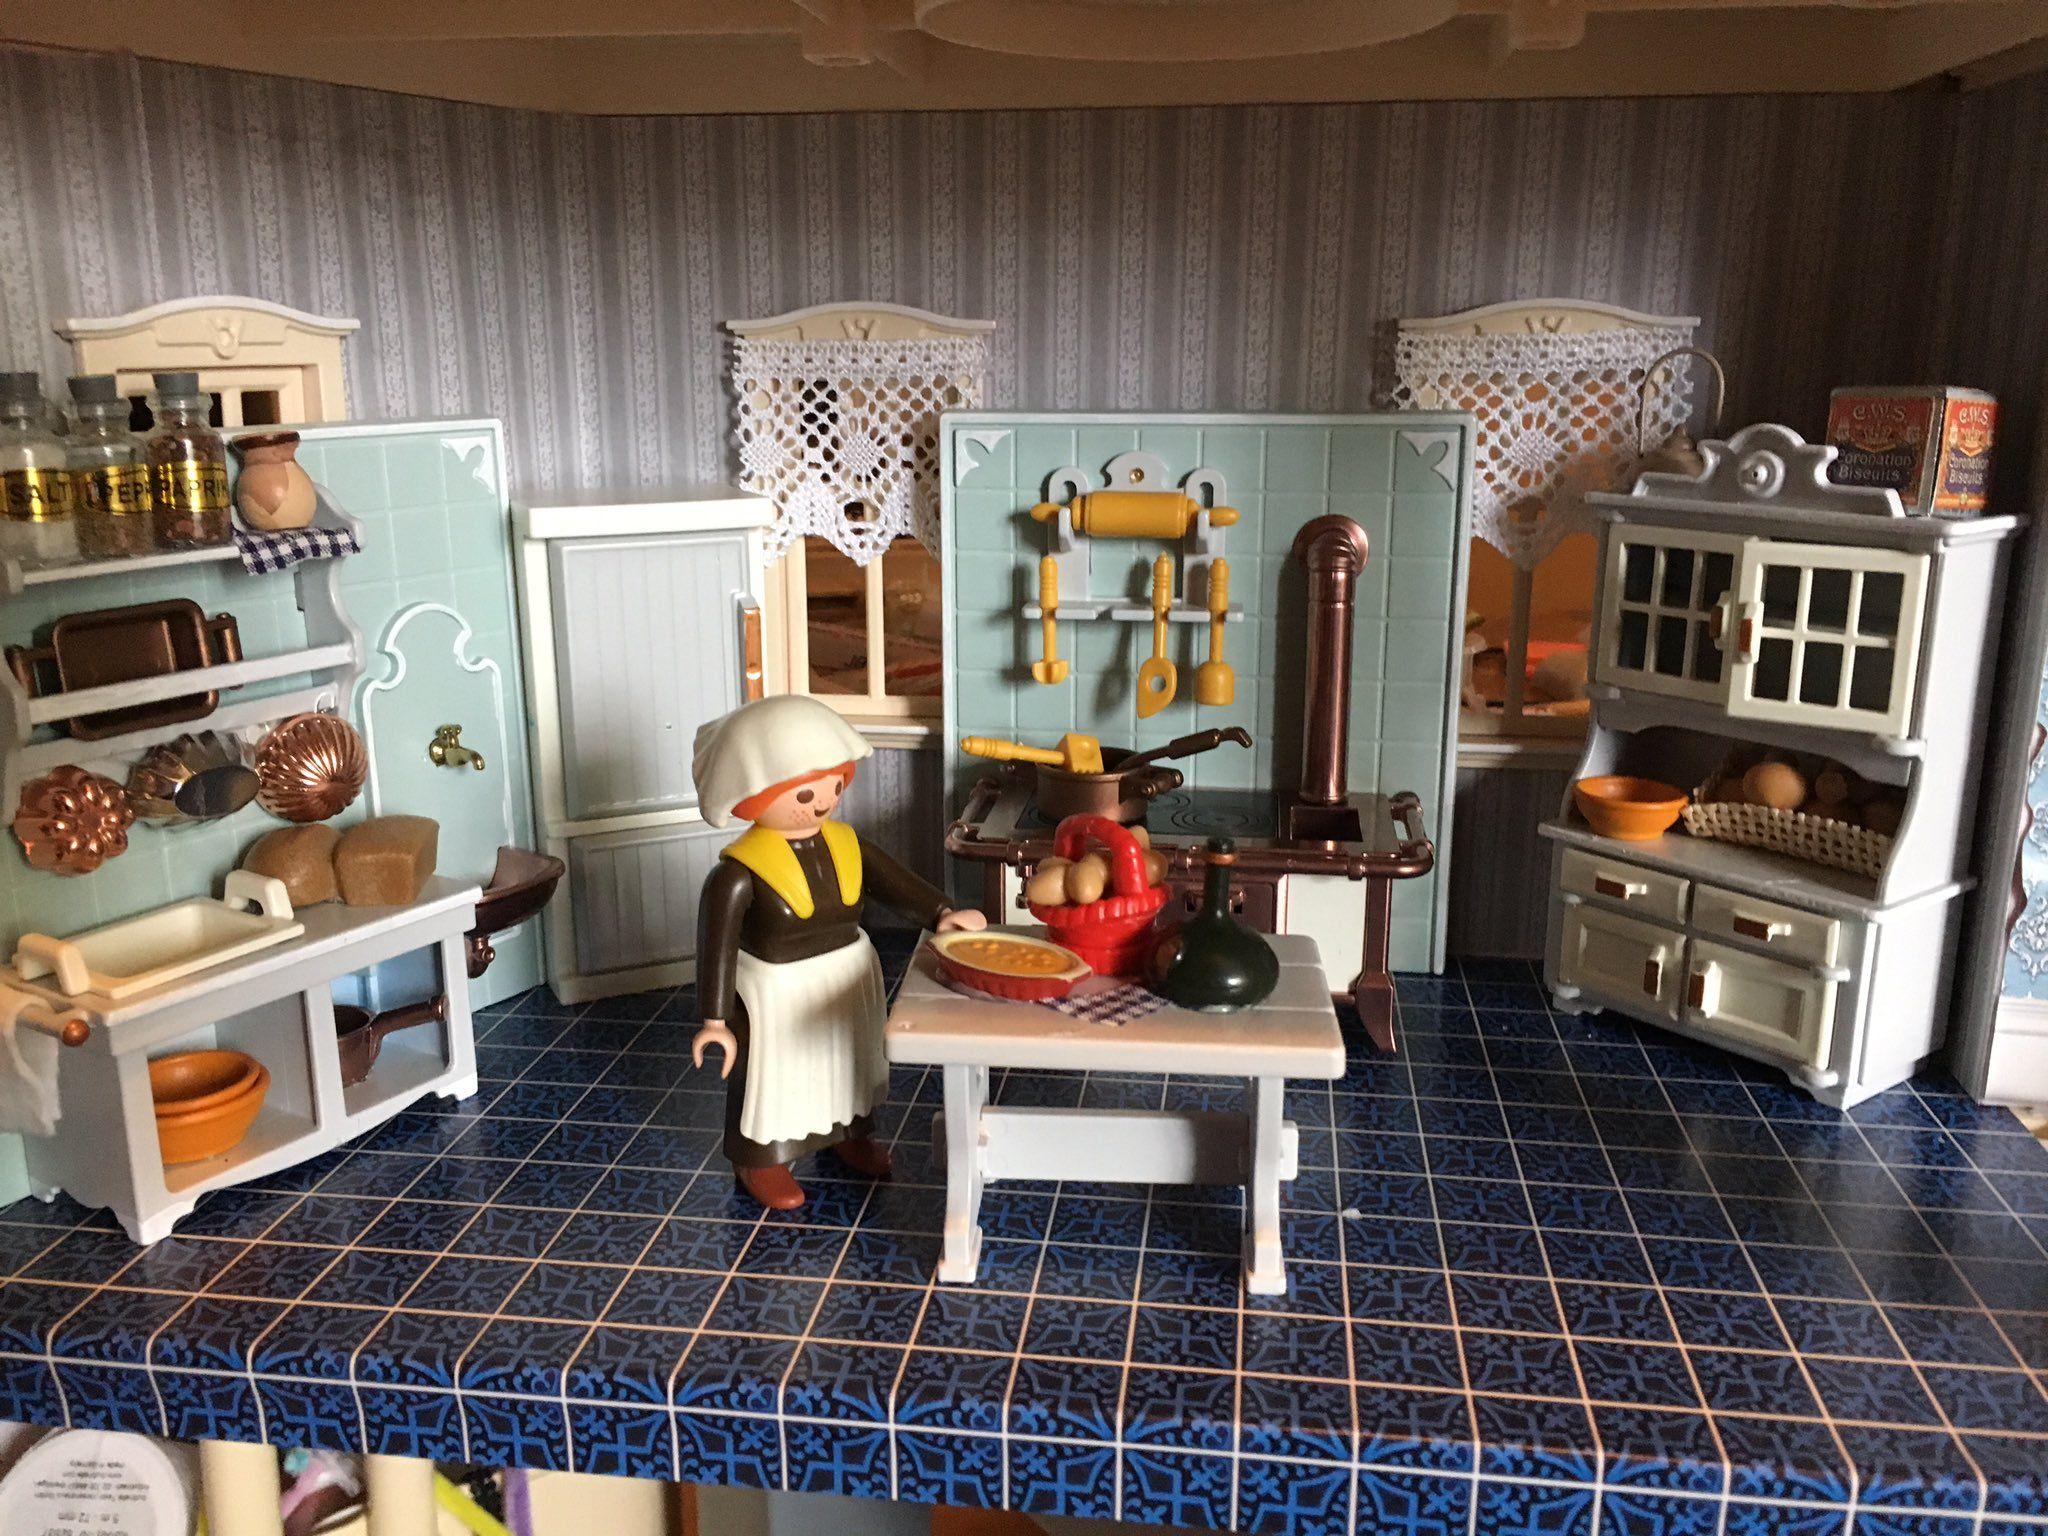 TheKattiveMess on | Playmobil and Victorian